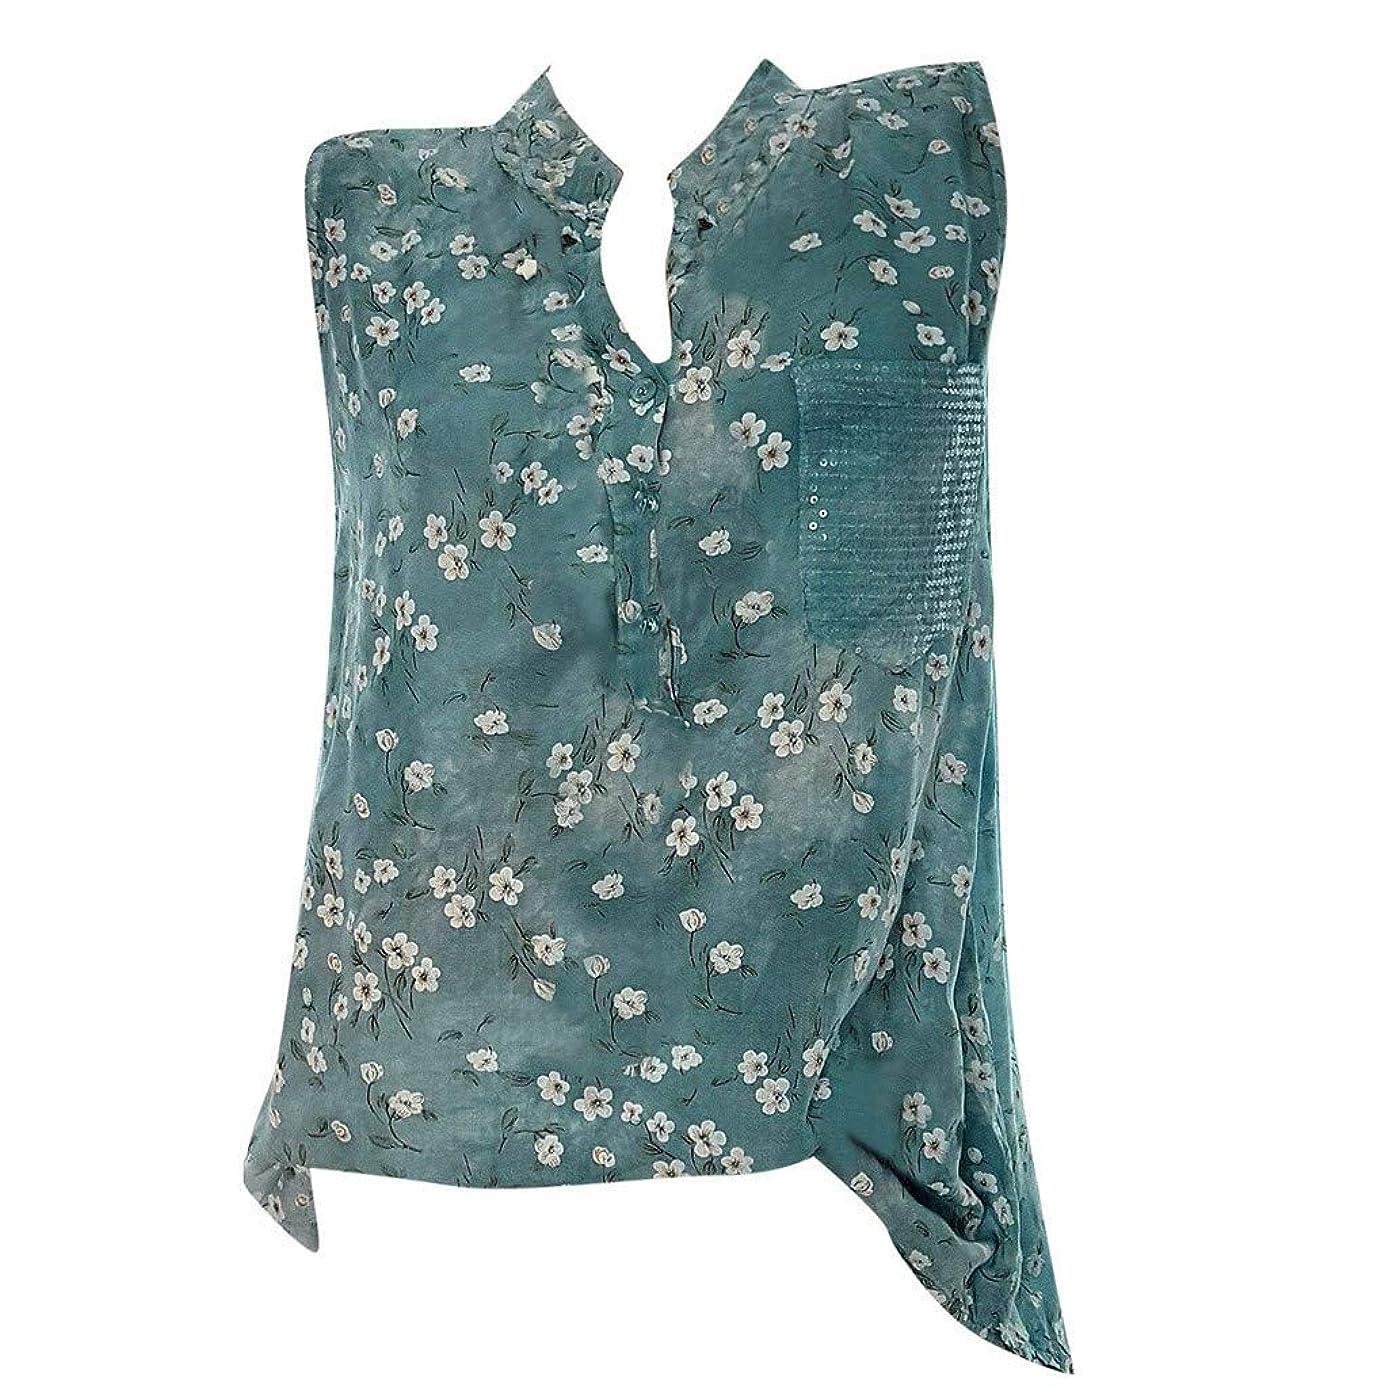 TUSANG Women Tees Summer Casual Short Sleeveless Buttons Shirt Tops Blouse Slim Fit Comfy Tunic Tops